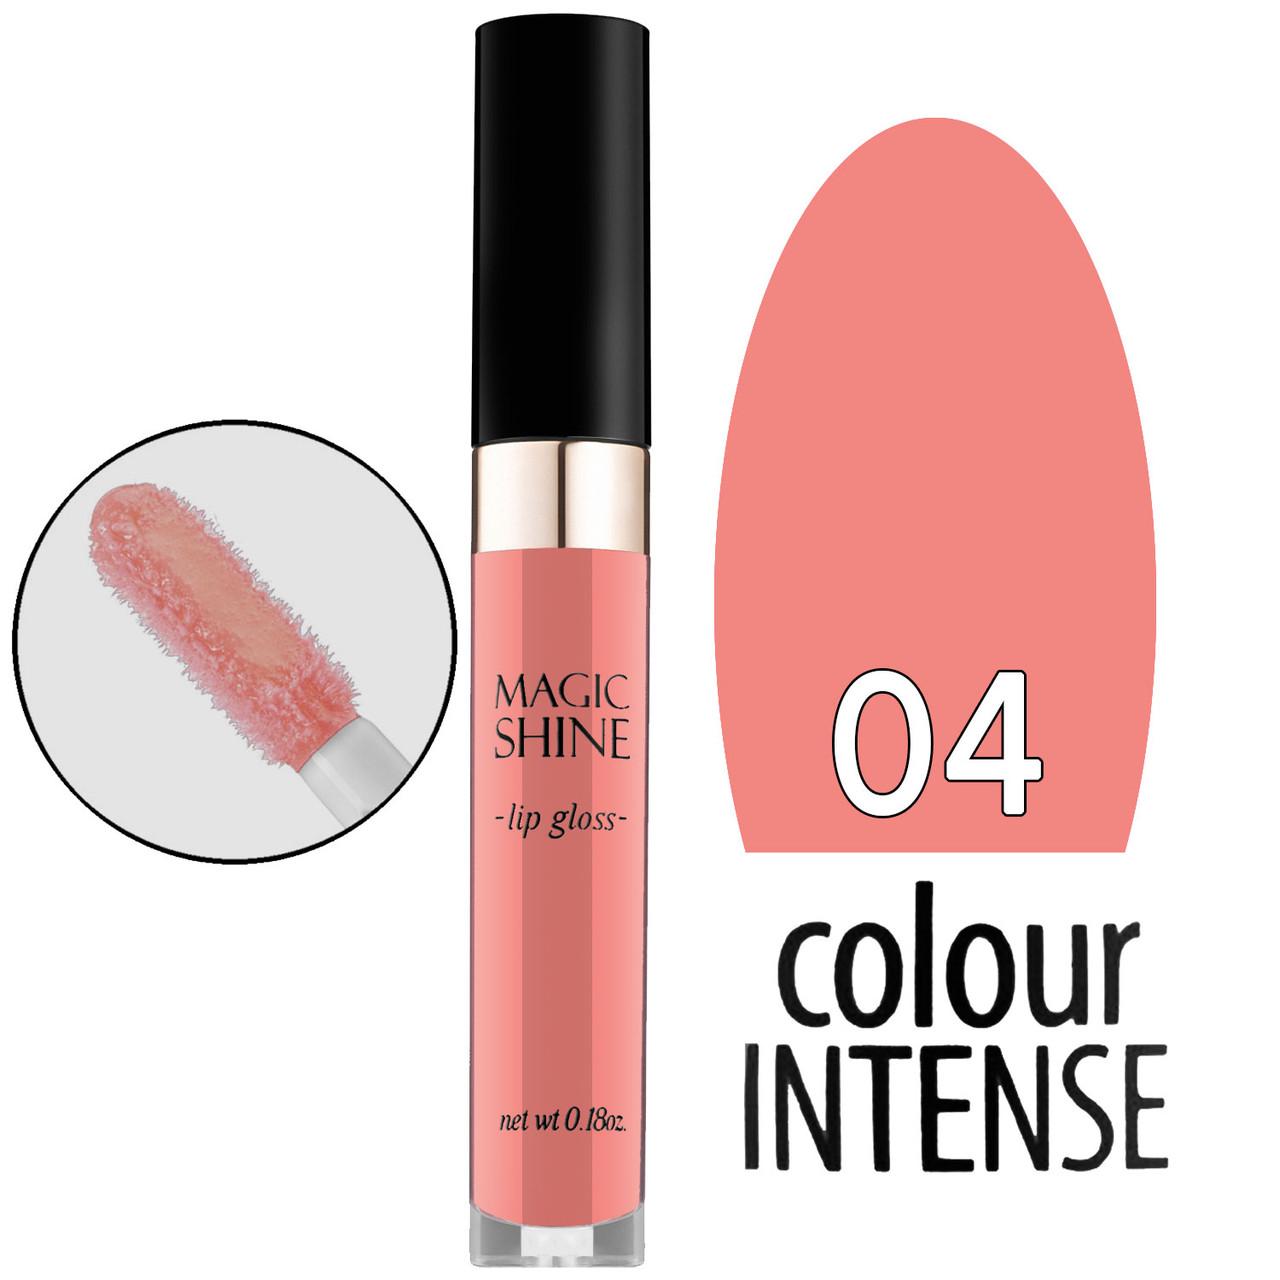 Colour Intense - Блеск для губ Magic Shine LG-103 Тон №04 pink natural глянцевый